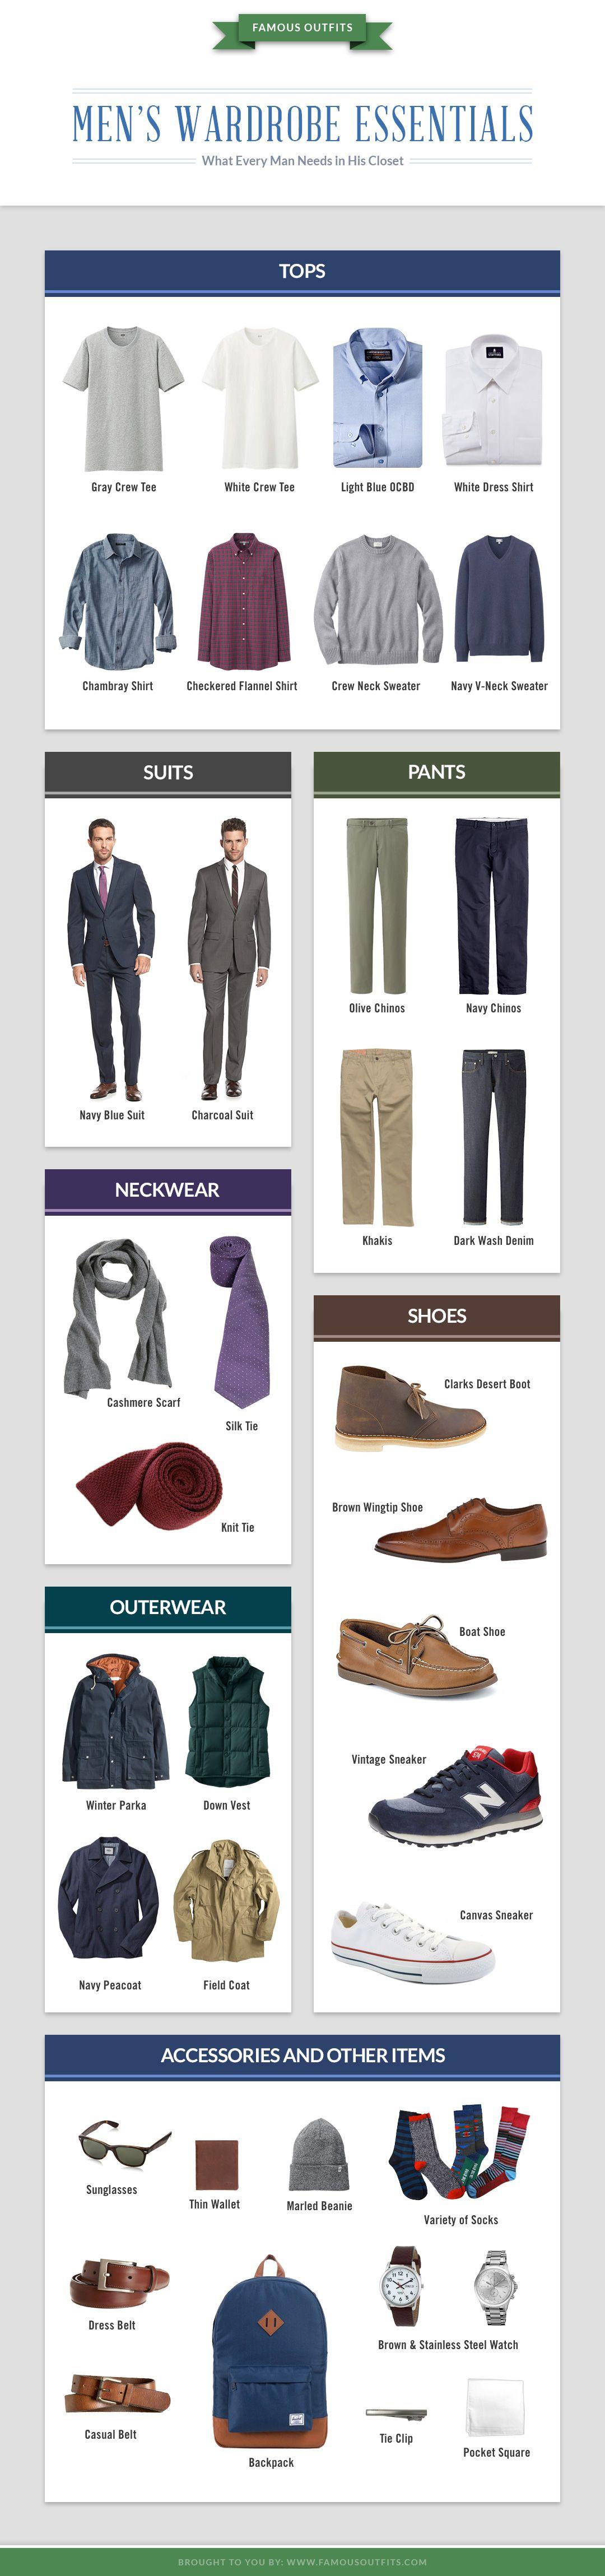 Men's Wardrobe Essentials (A Visual Guide) | Wardrobes and ...